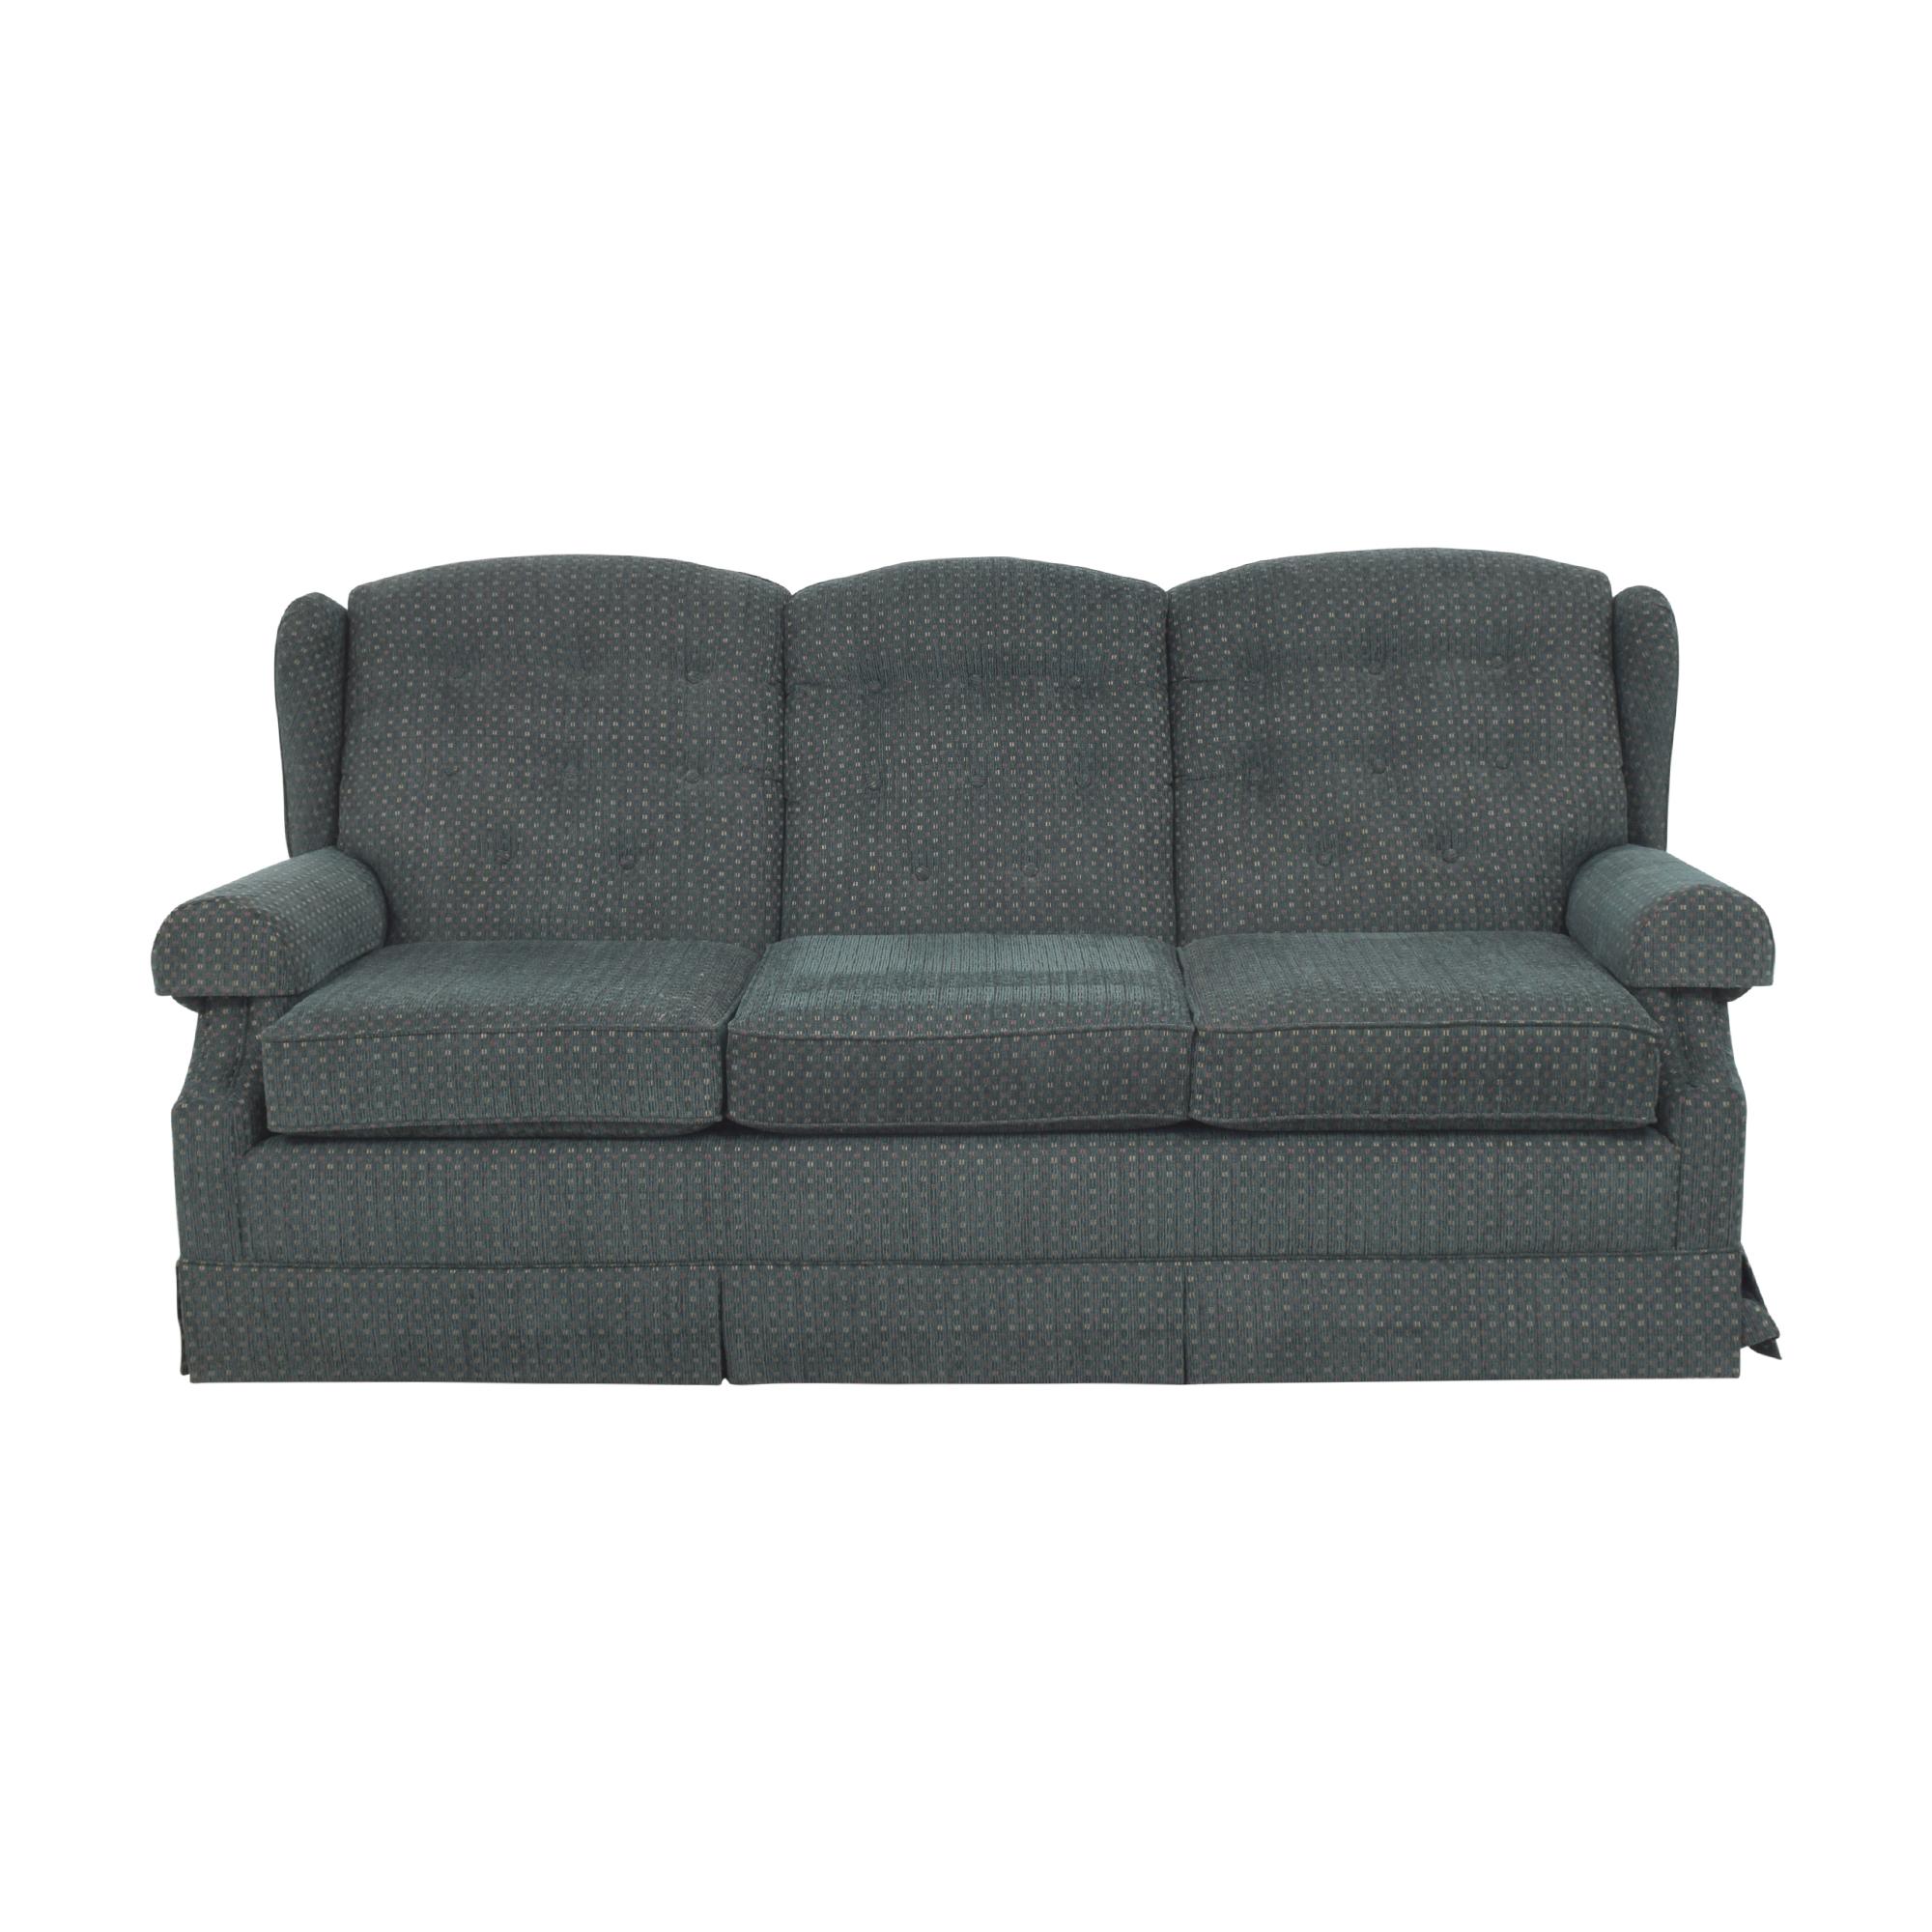 La-Z-Boy La-Z-Boy Tufted Sofa  Classic Sofas